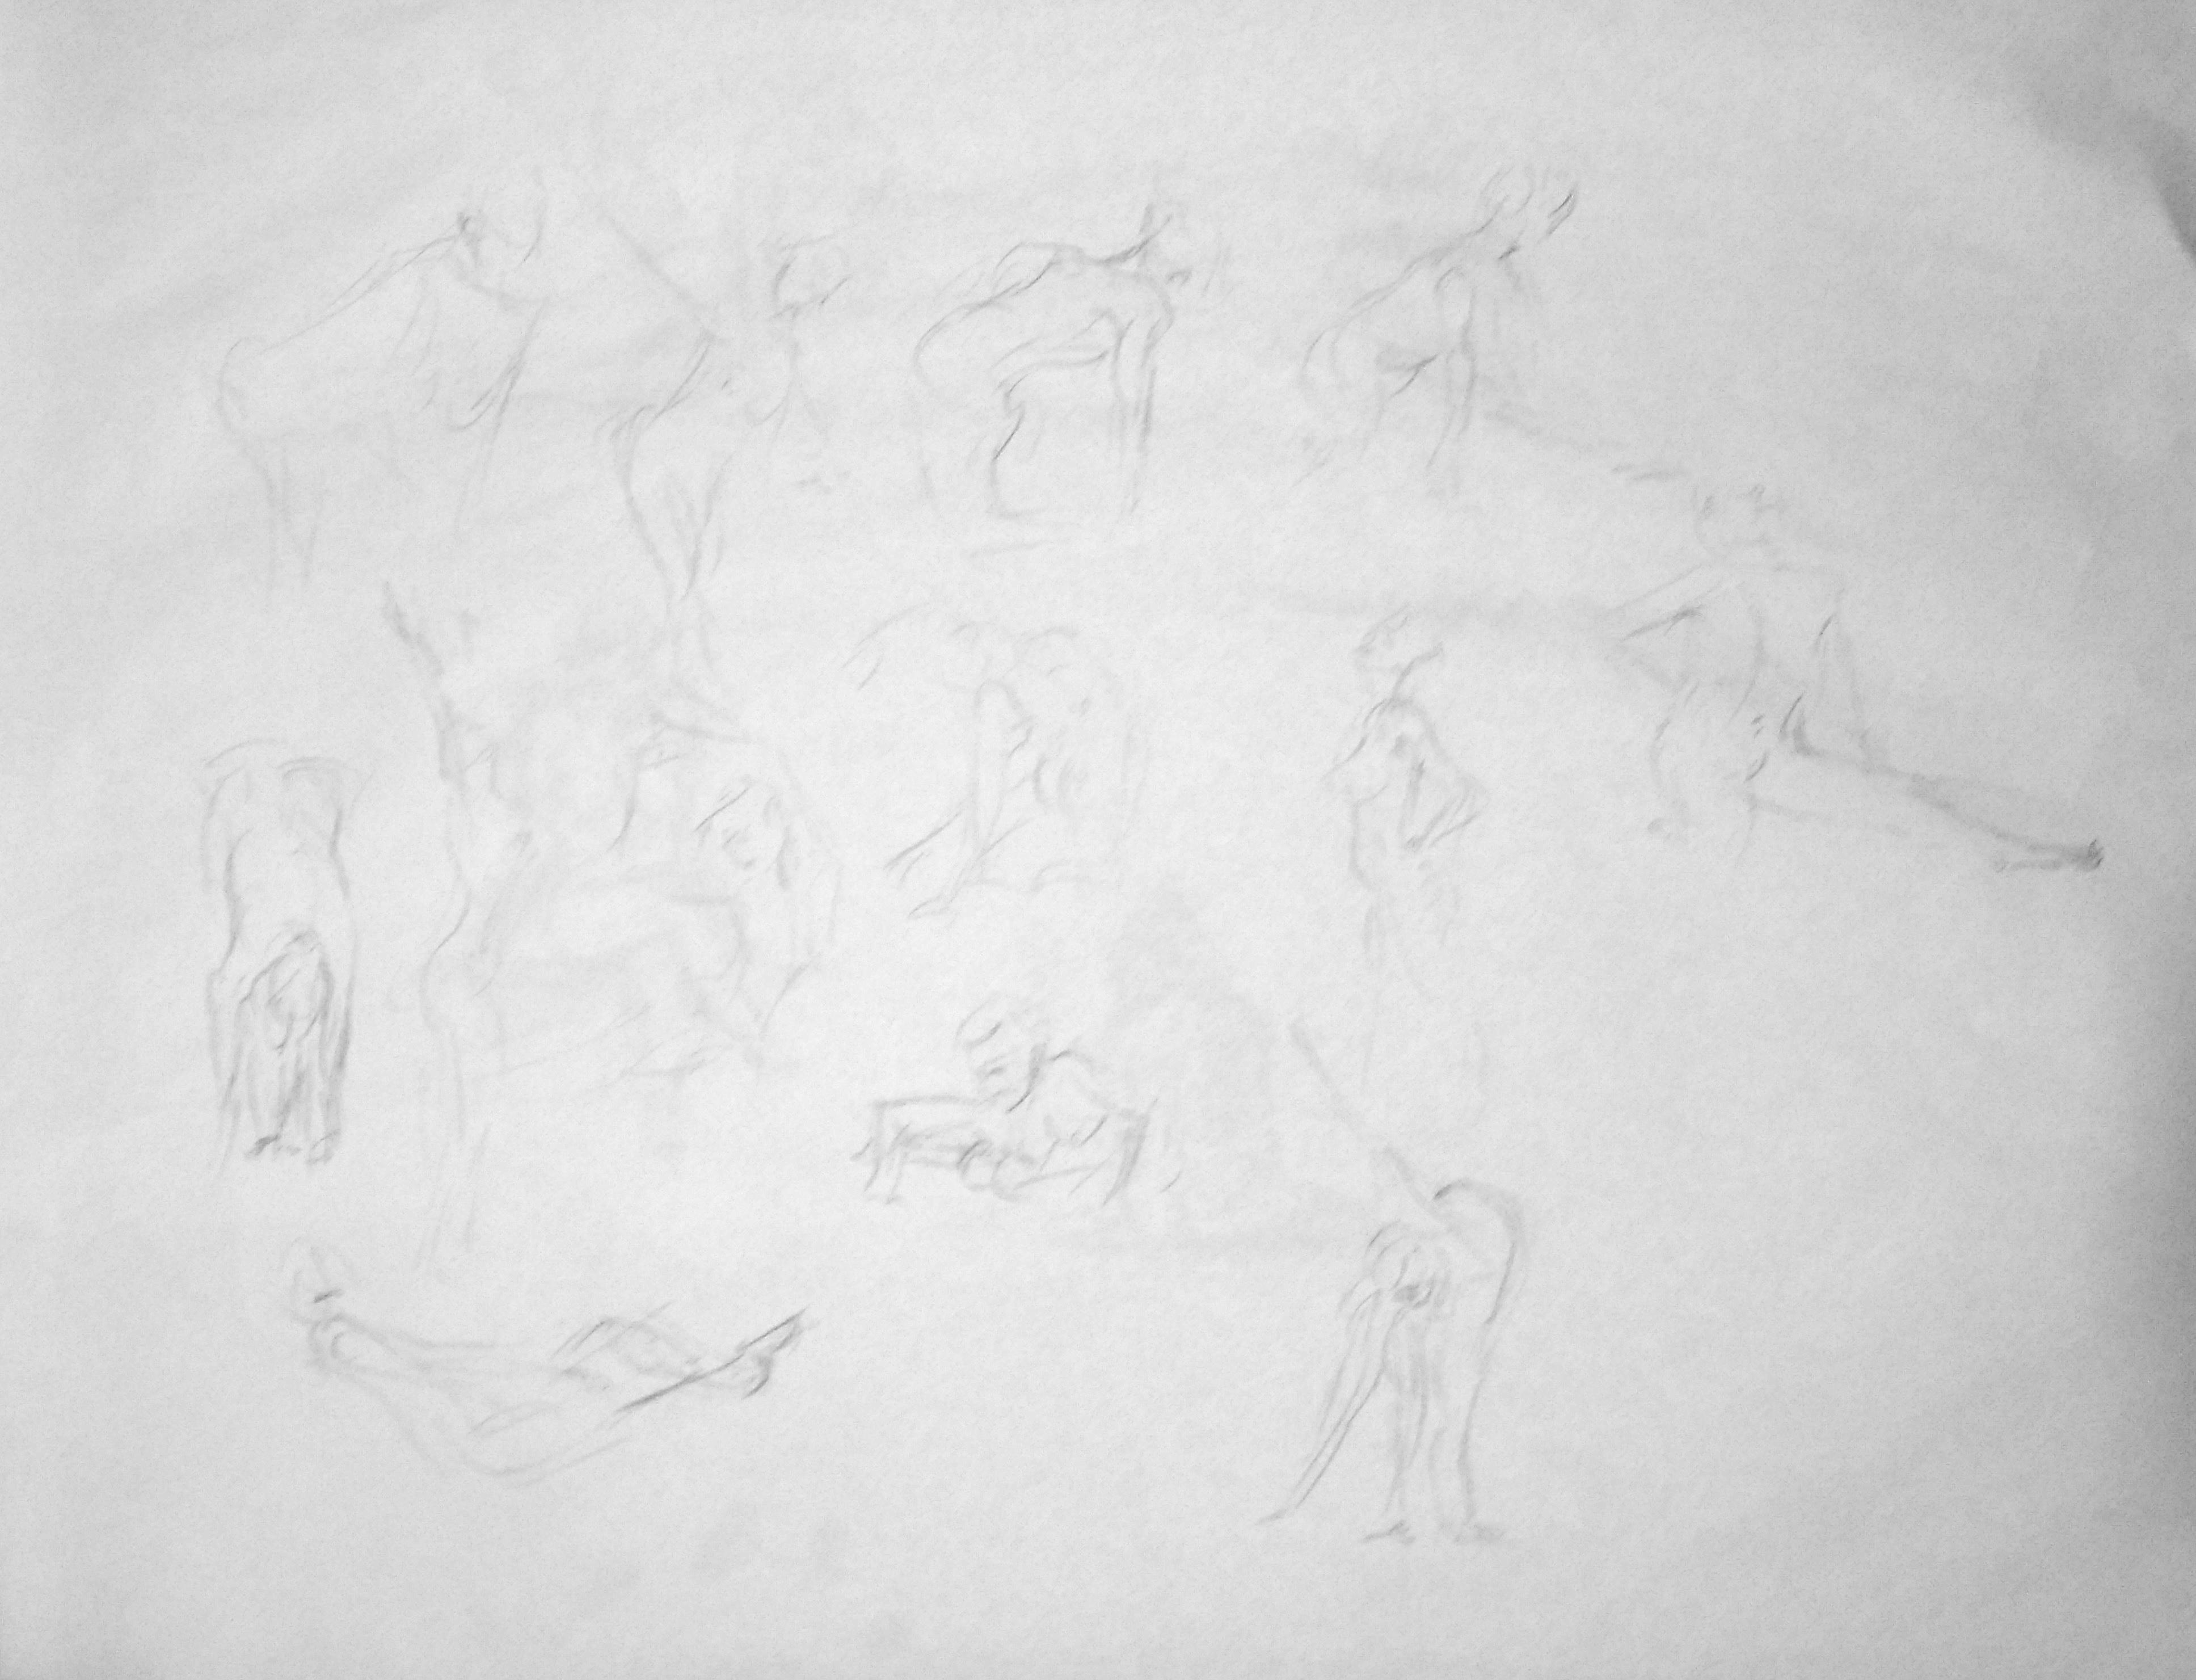 John Huisman pencil sketches, AWE figure drawing 11-10-18